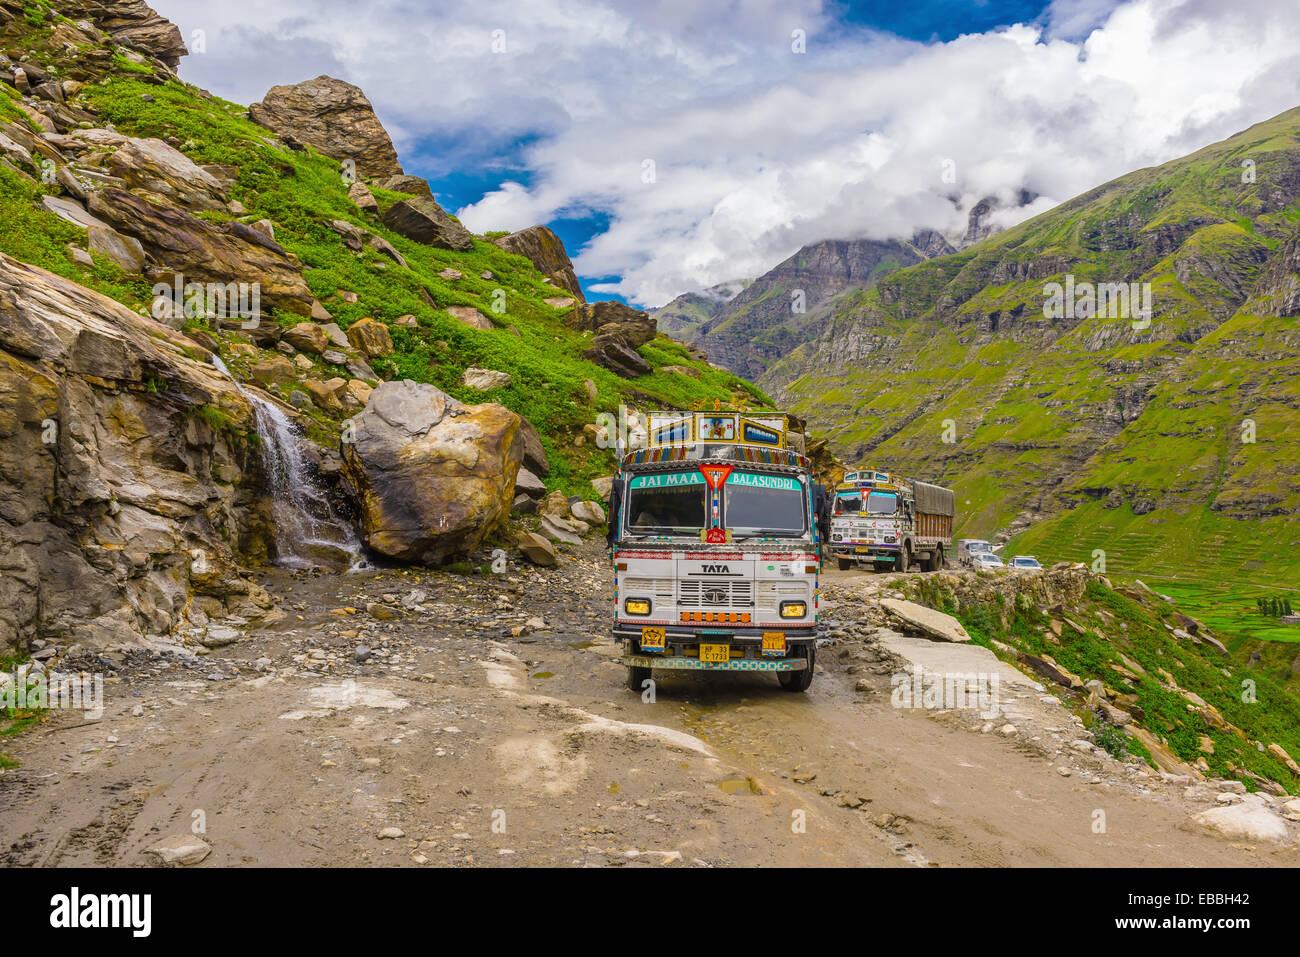 13 Asia cloud color image connect foot highway Himachal Pradesh Himalayas horizontal India lahaul Leh-Manali Manali - Stock Image